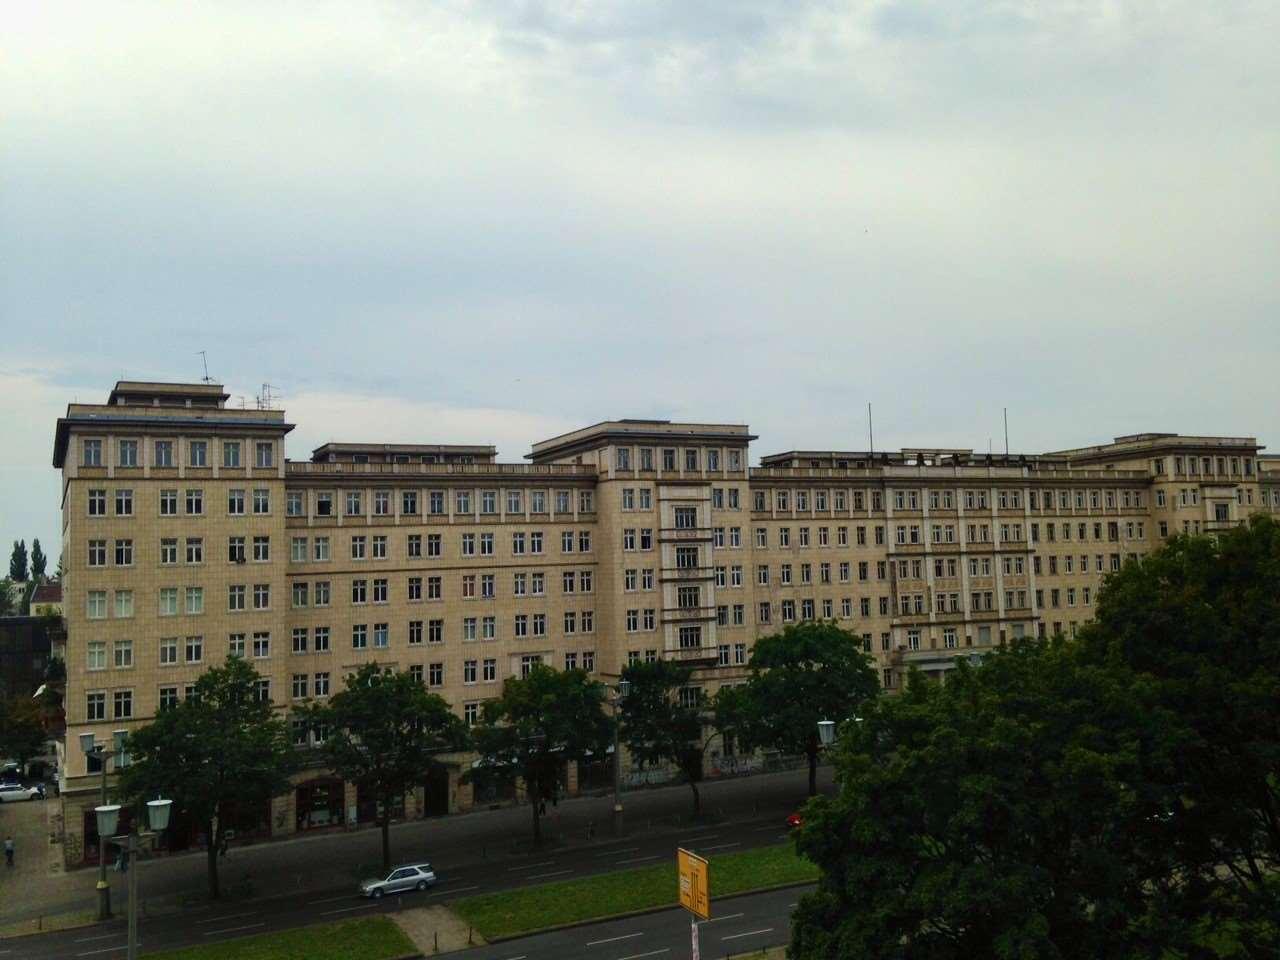 frankfurter building